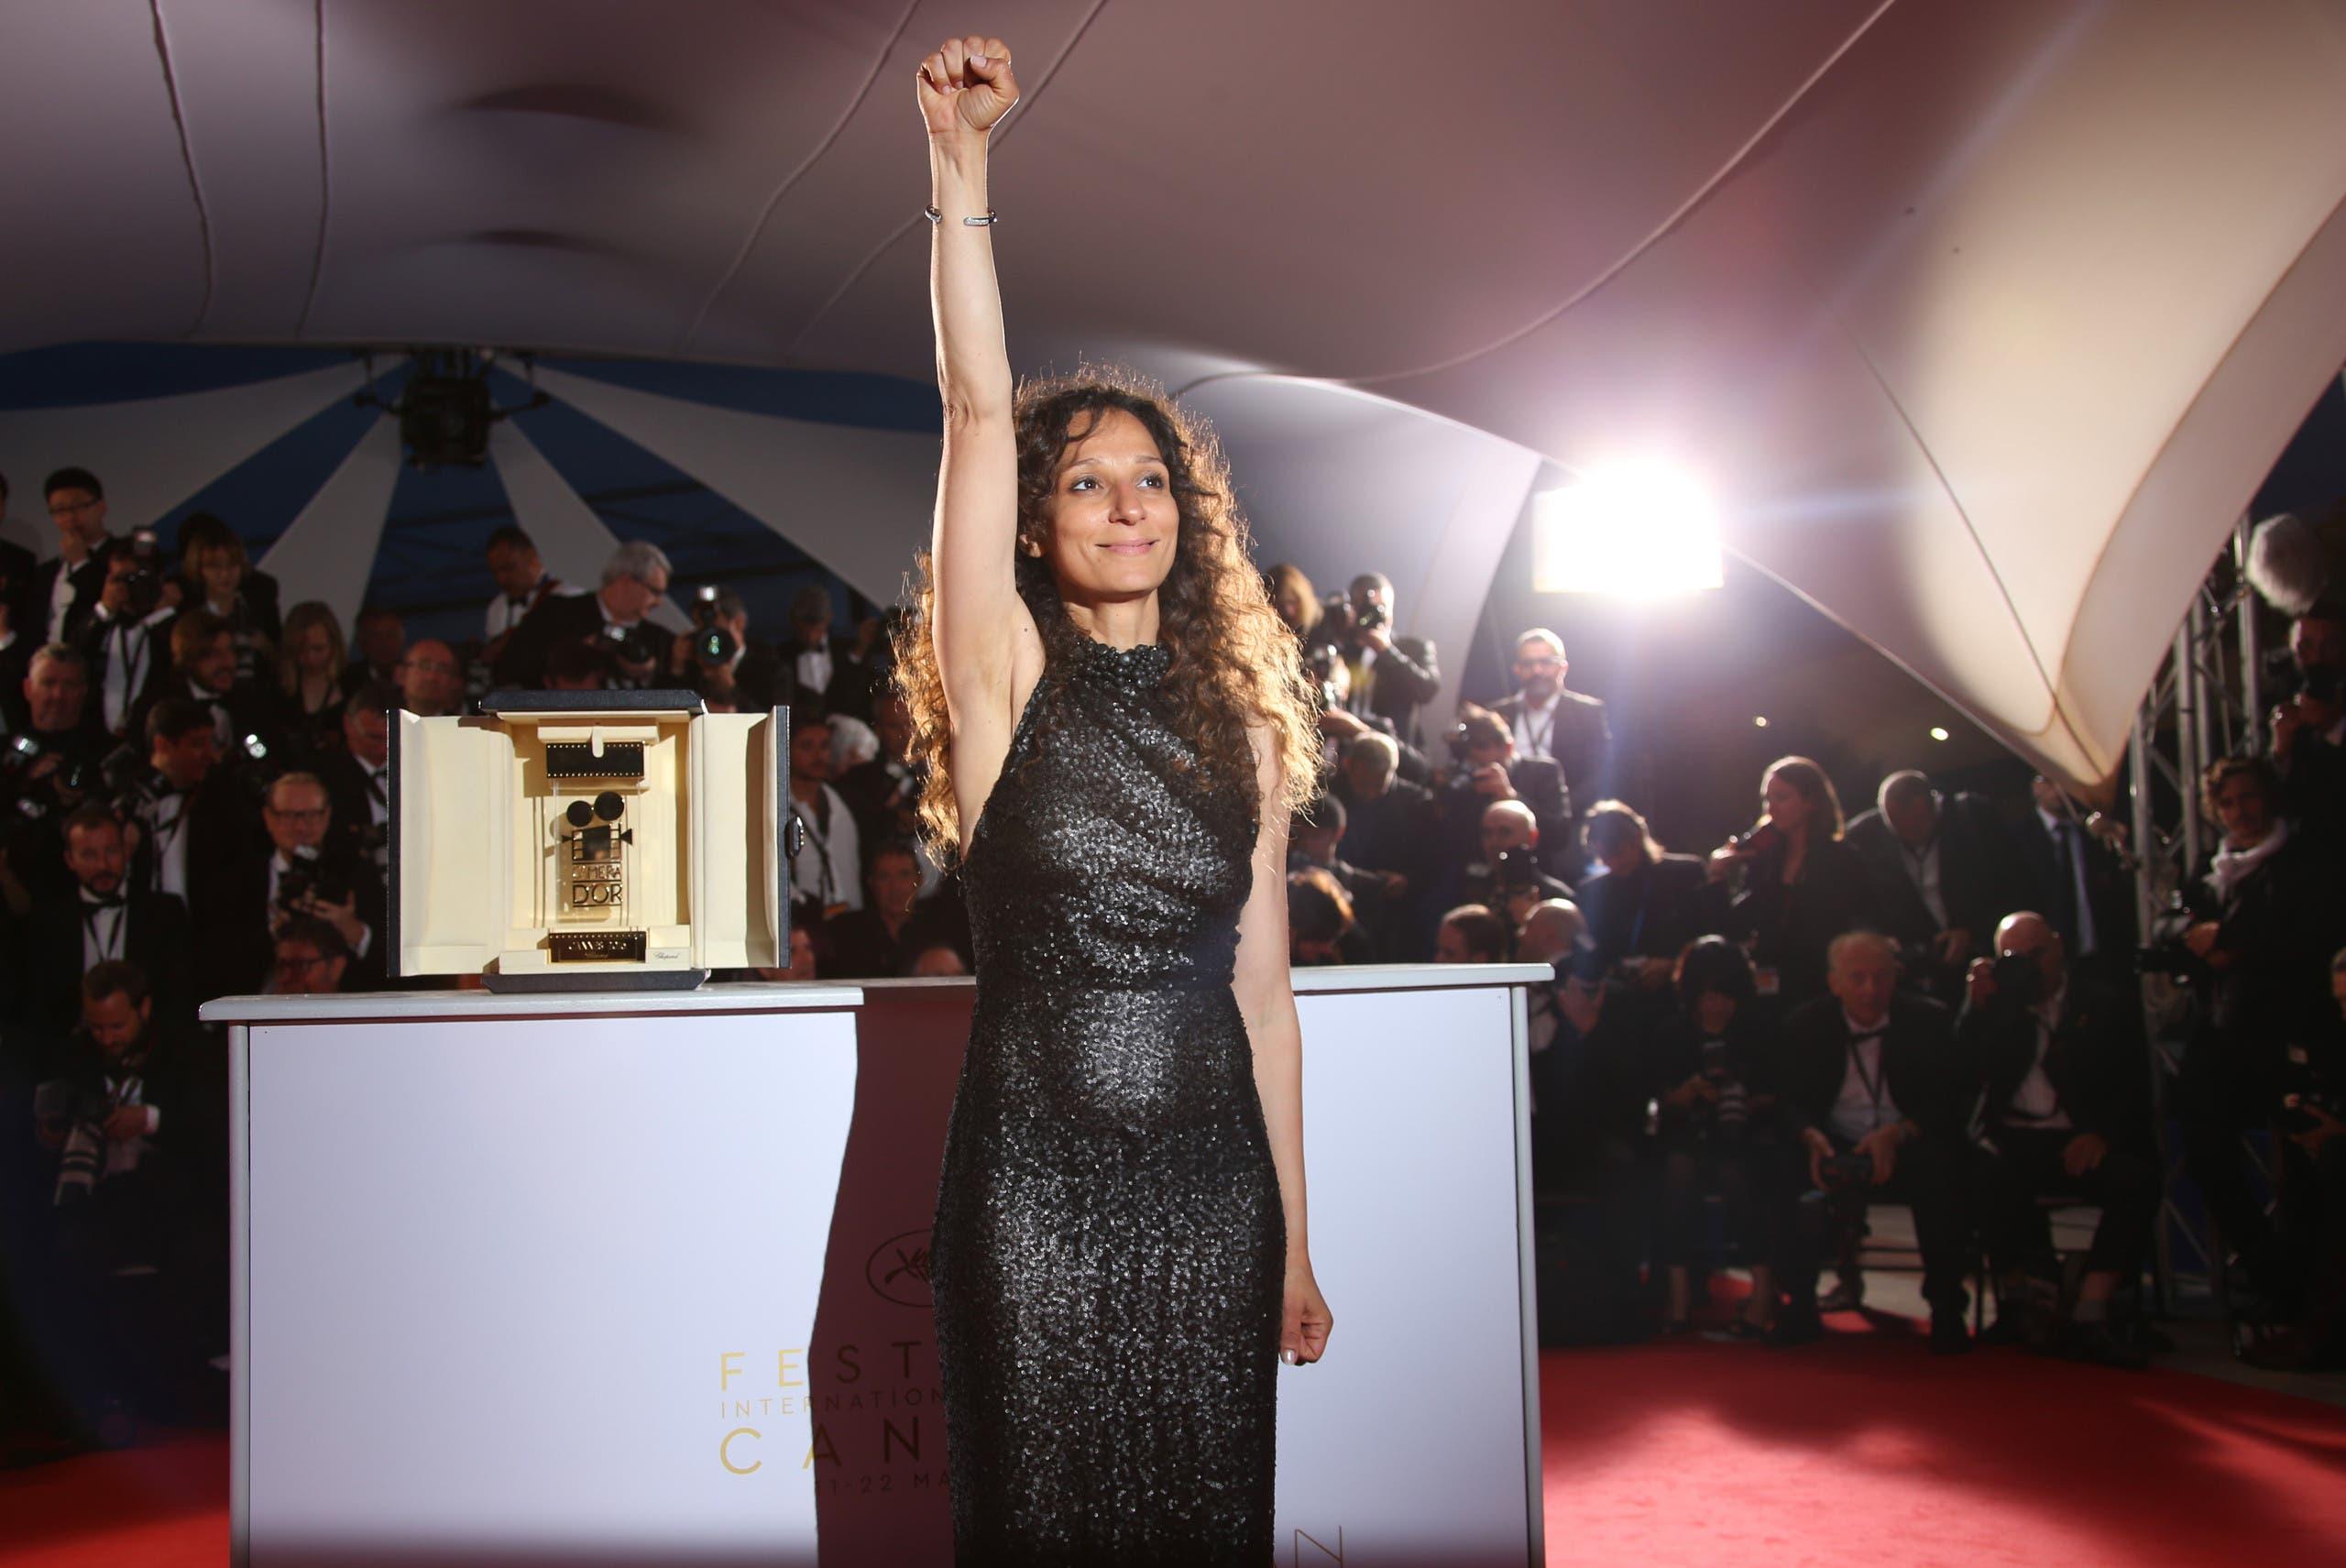 Cannes top picks: 'Divines,' a moving gender-bending girl buddy film